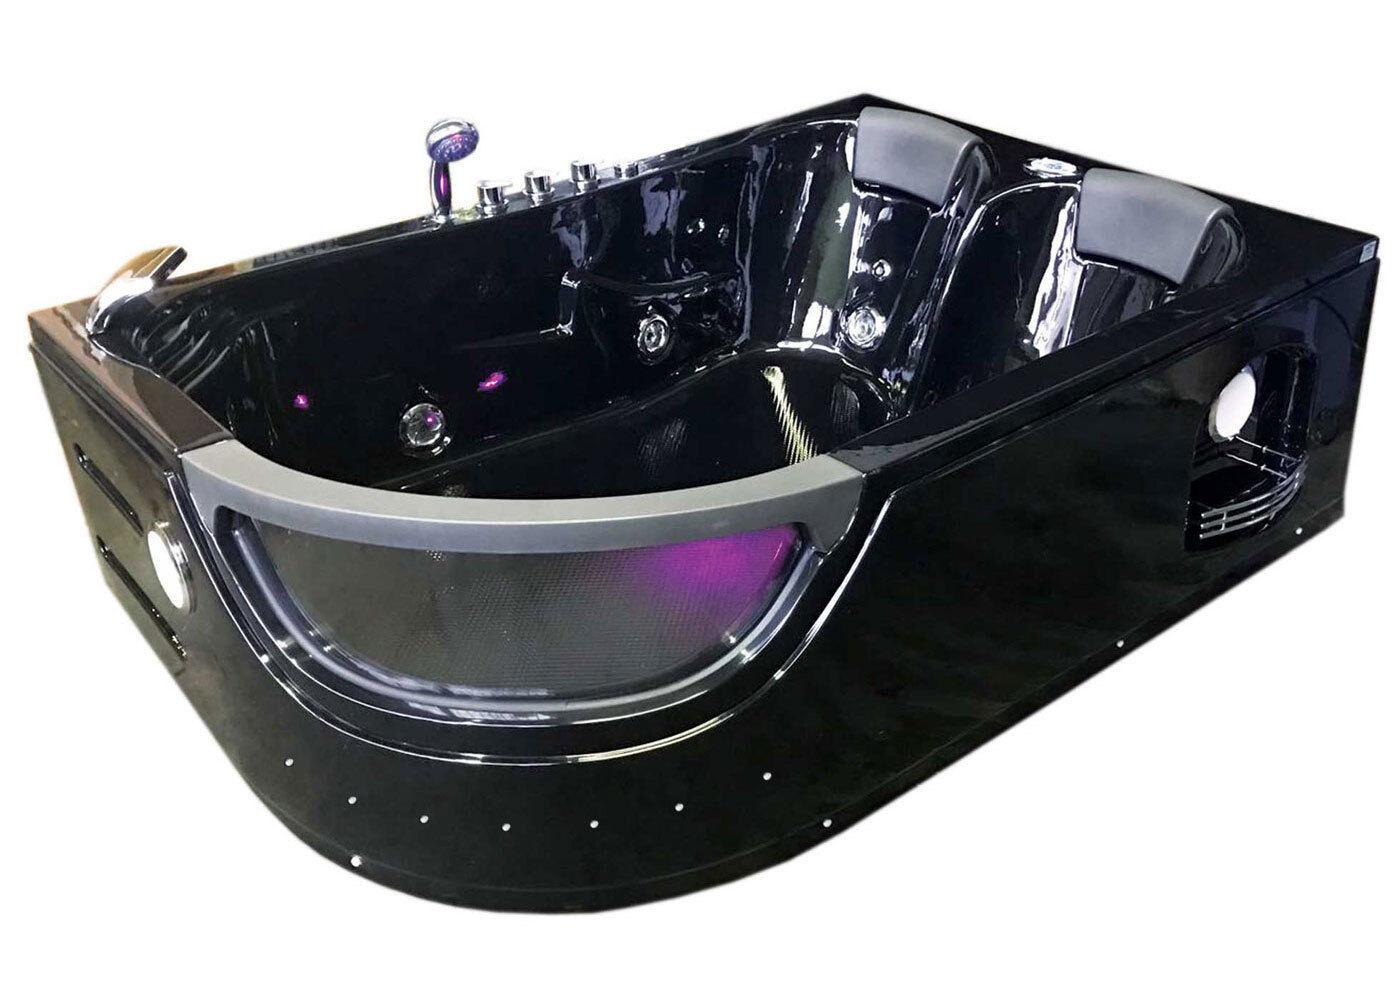 whirlpool bathtub hydrotherapy black hot tub double